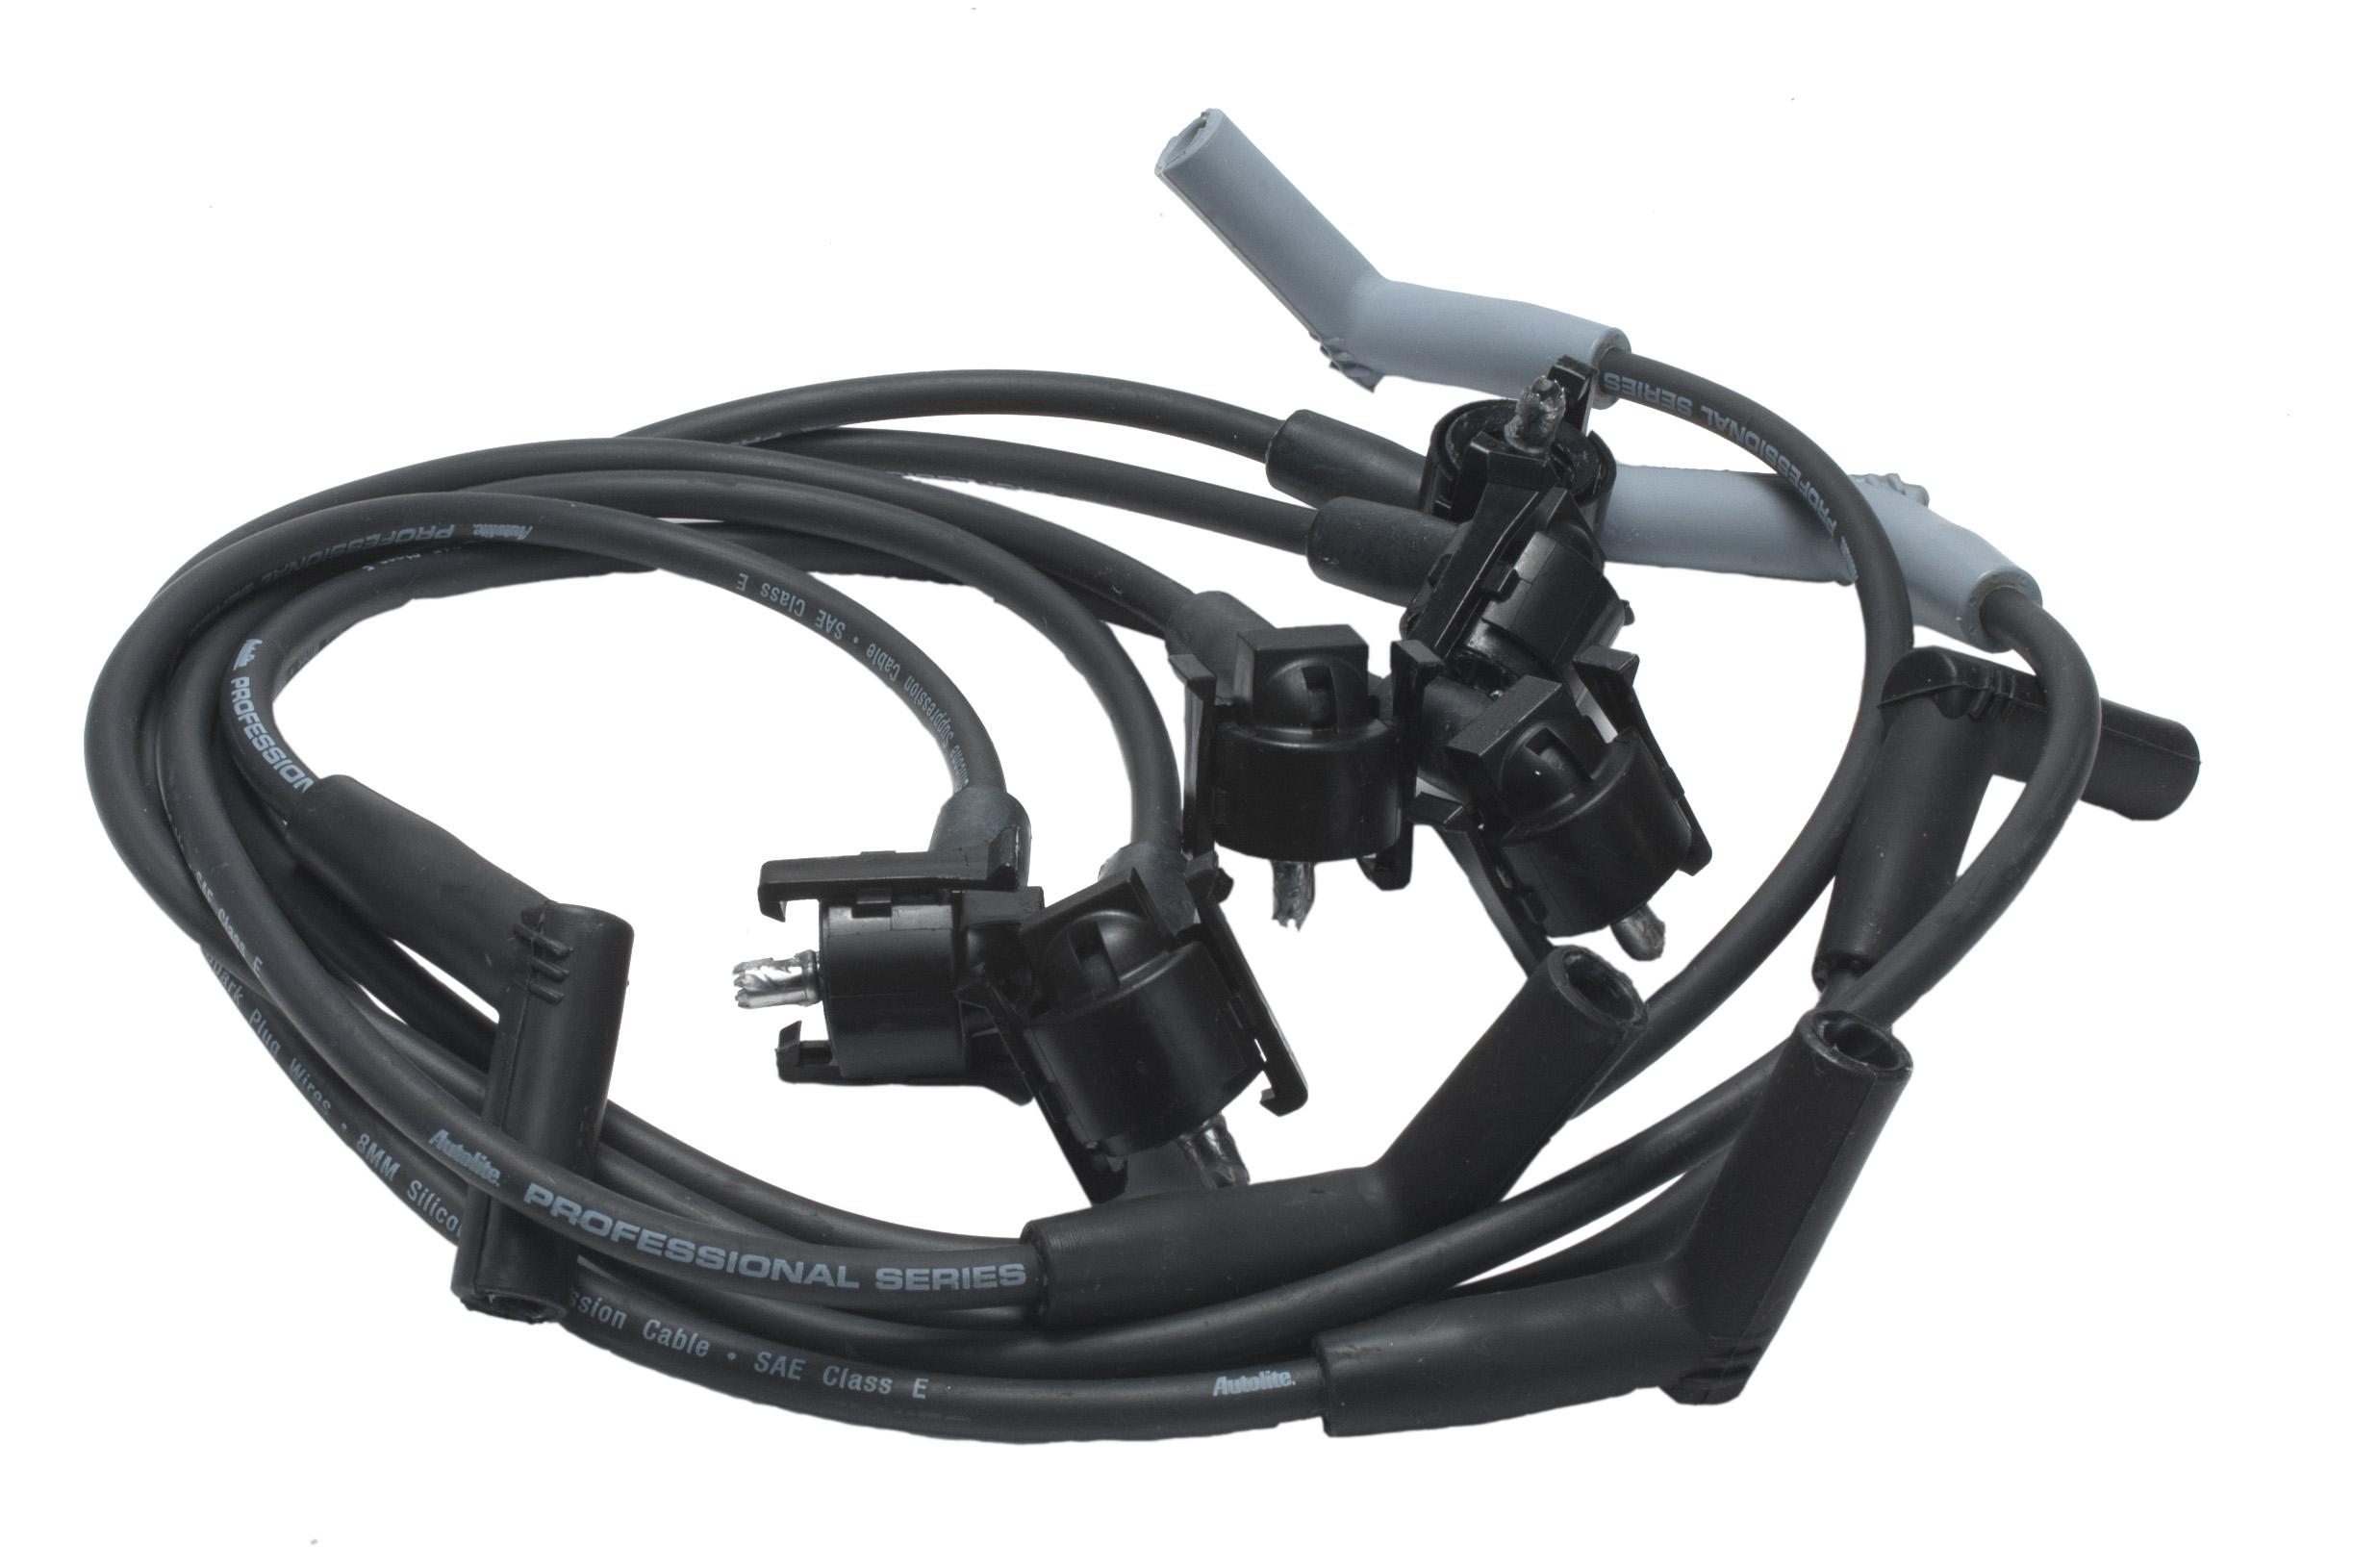 2004 pontiac grand prix ignition wiring diagram 2002 chevy cavalier engine get free